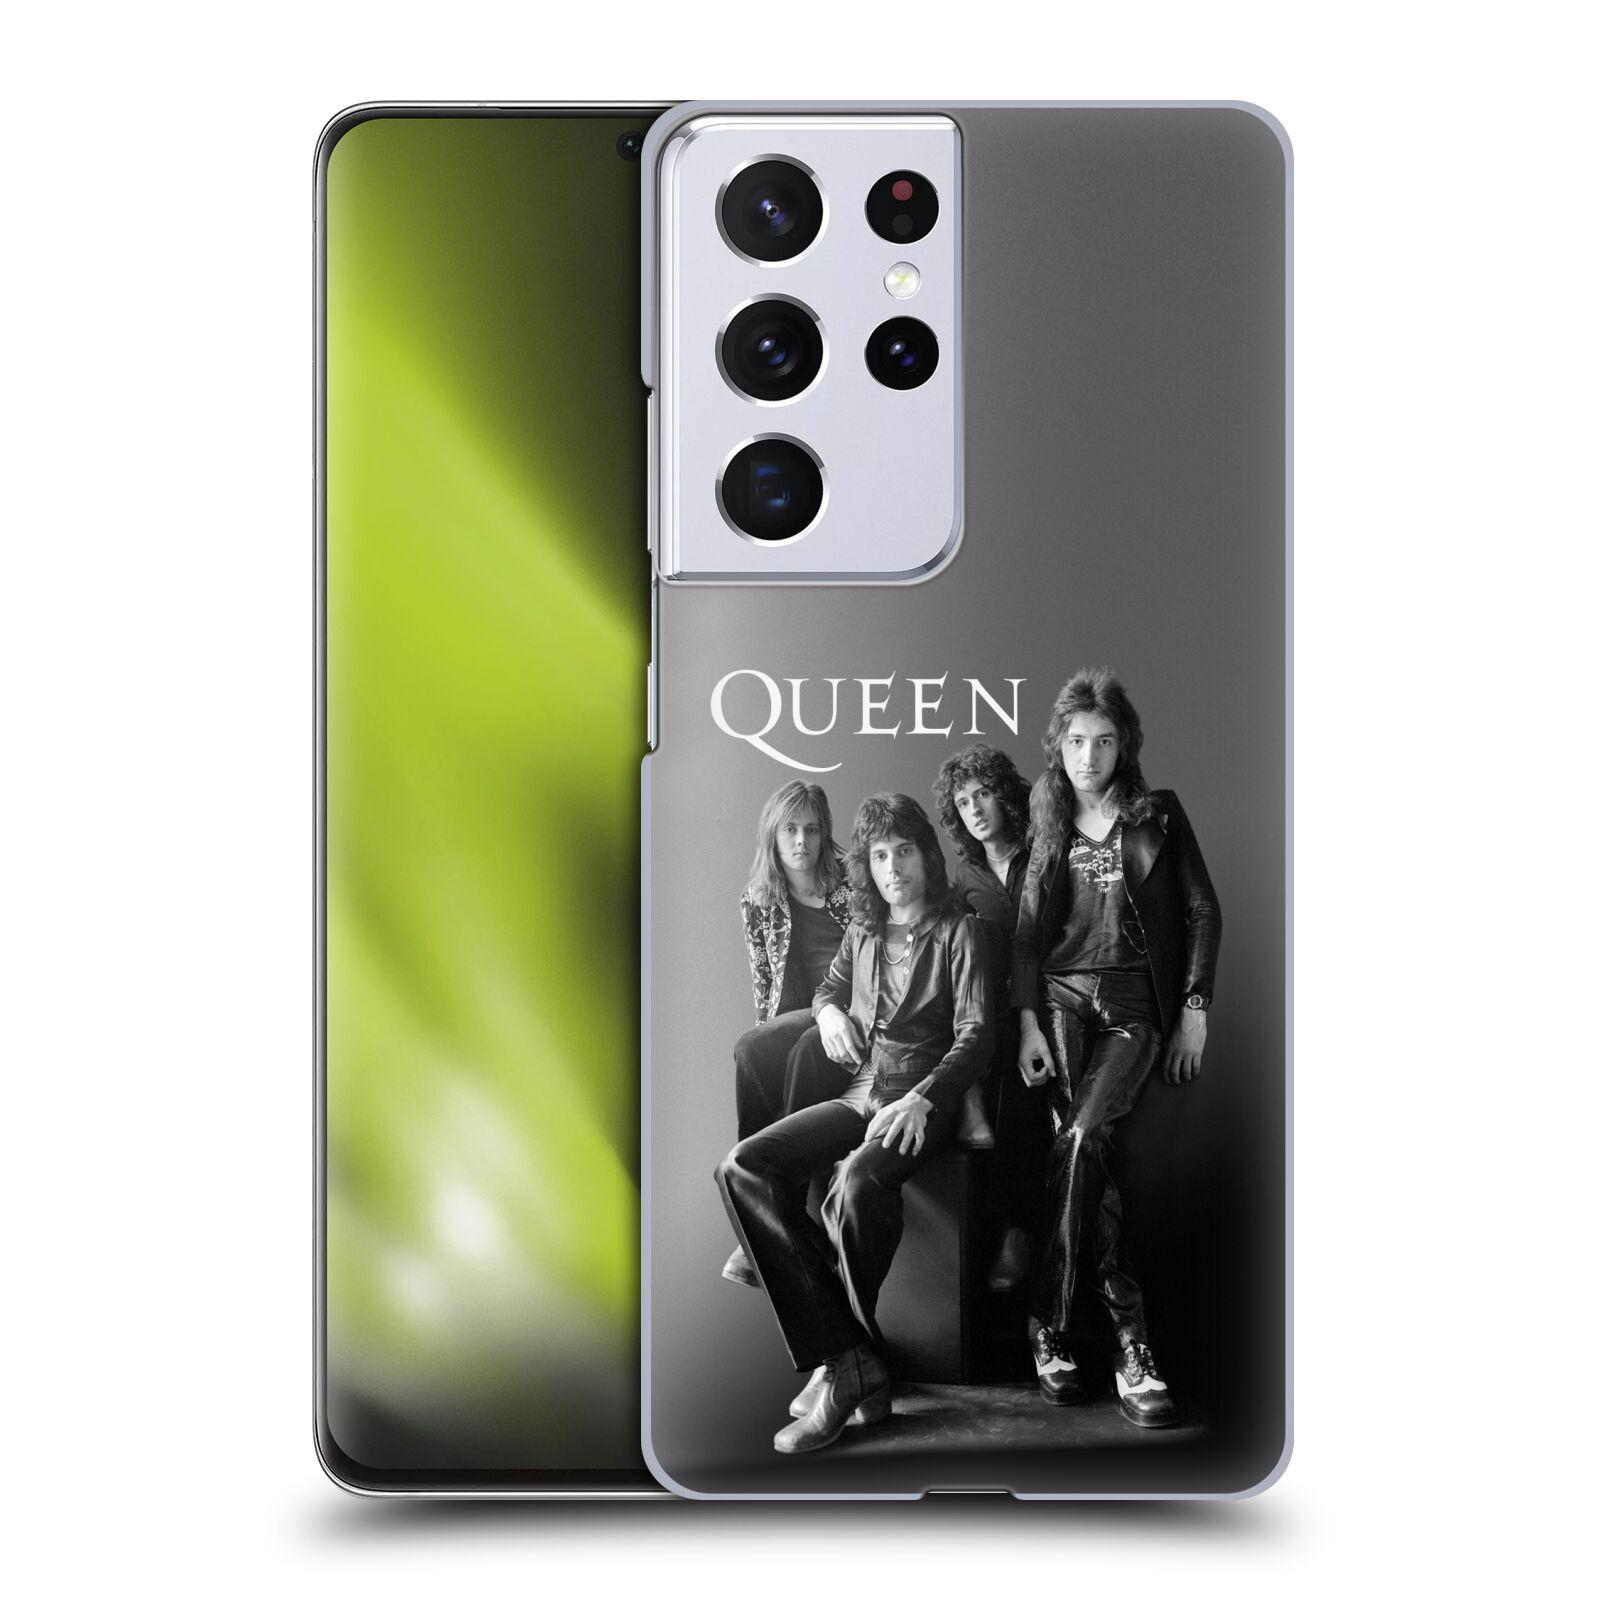 Plastové pouzdro na mobil Samsung Galaxy S21 Ultra 5G - Head Case - Queen - Skupina